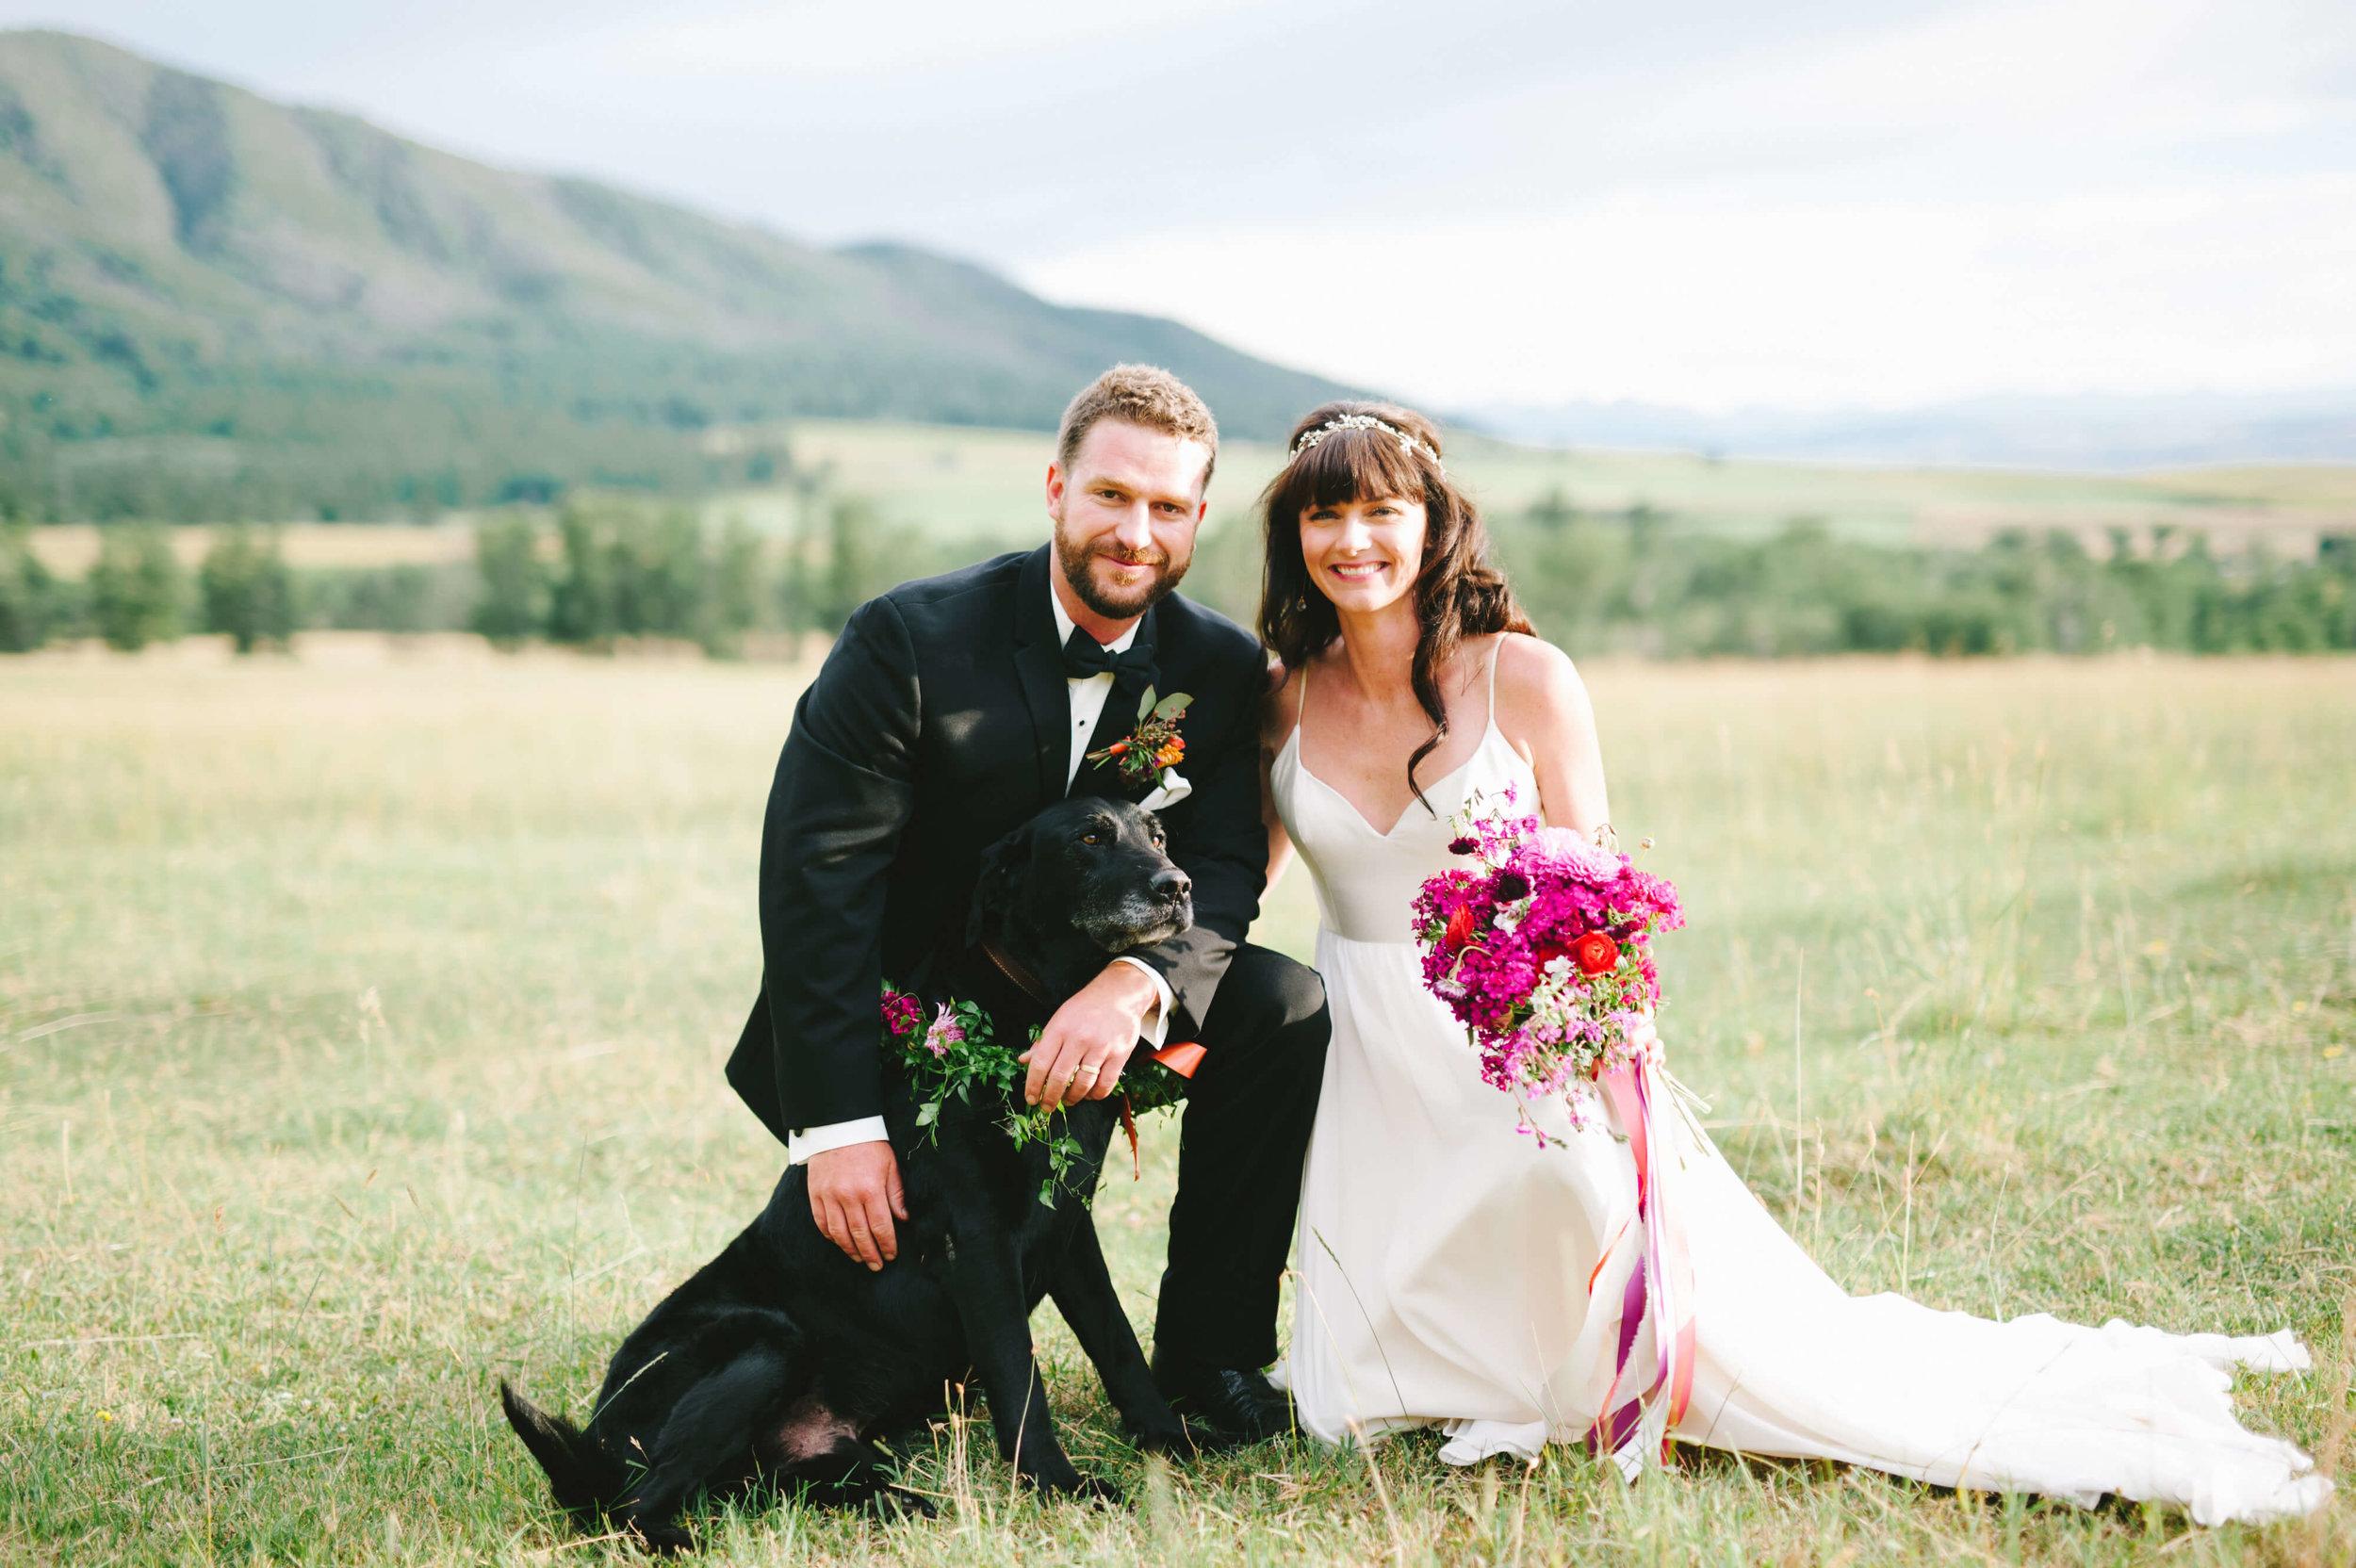 engle-olson-fran-ze-photo-montana-wedding-105.jpg